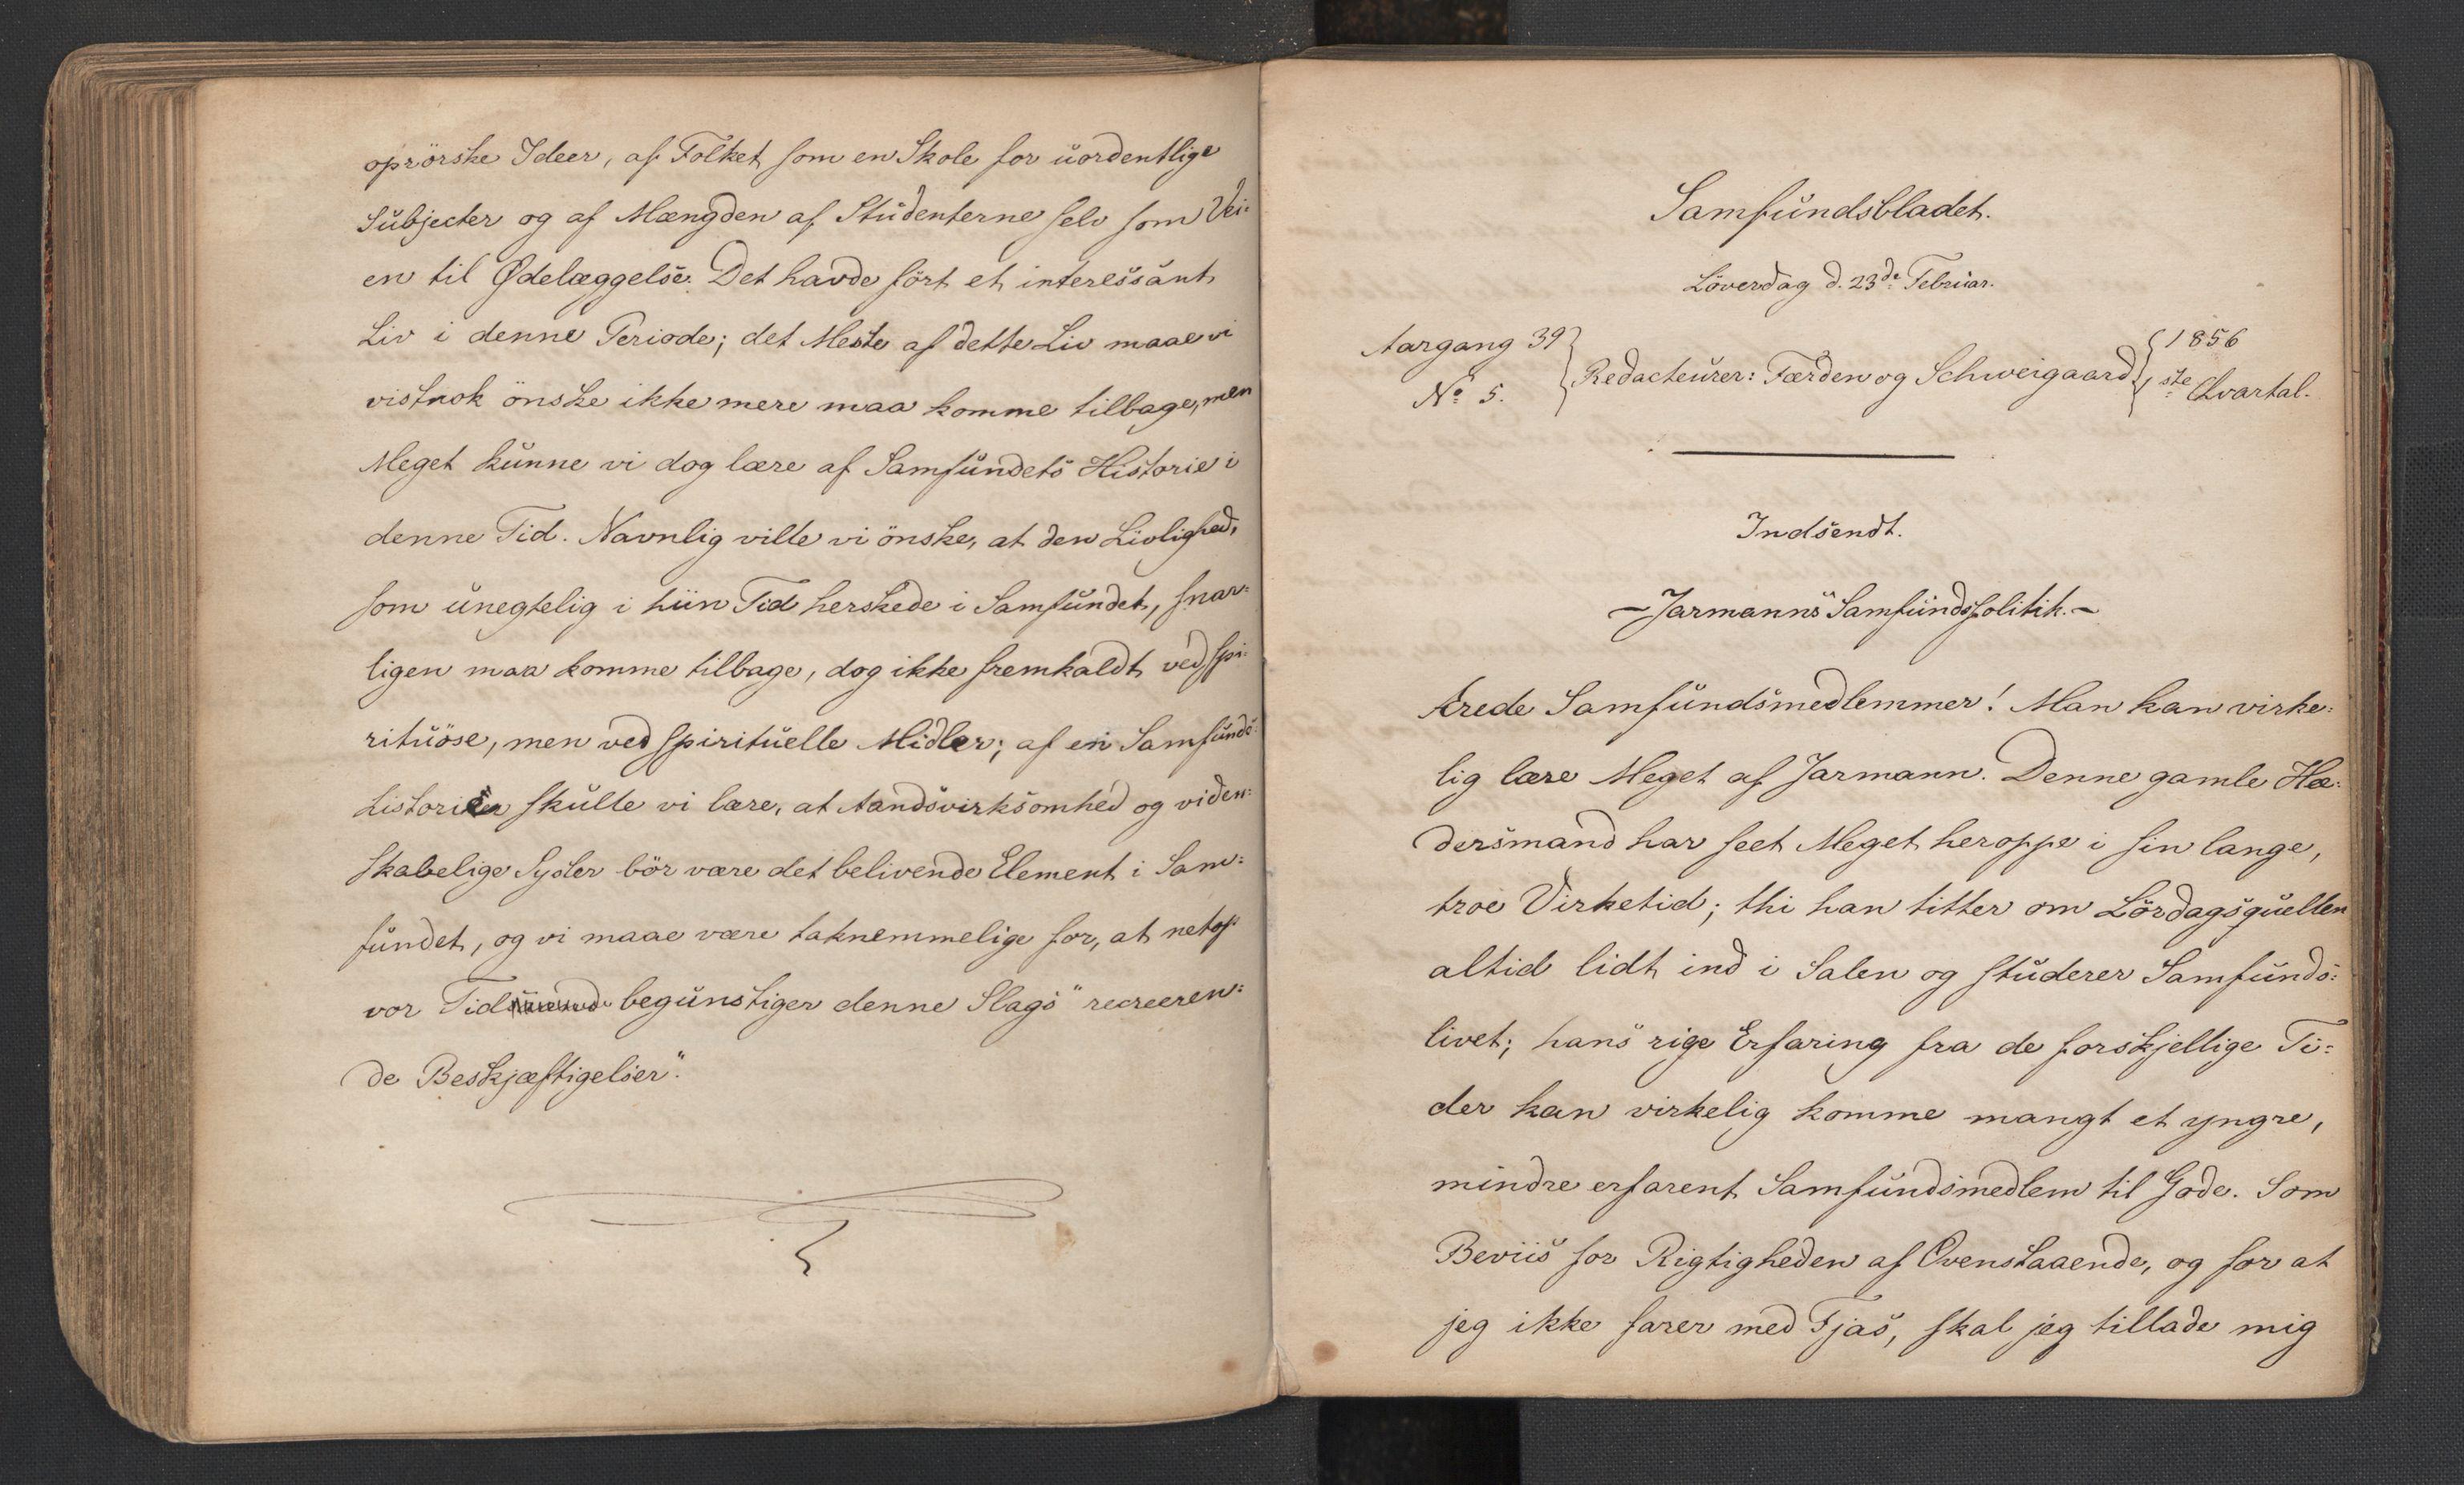 RA, Det Norske Studentersamfund, X/Xa/L0005, 1855-1856, s. 158